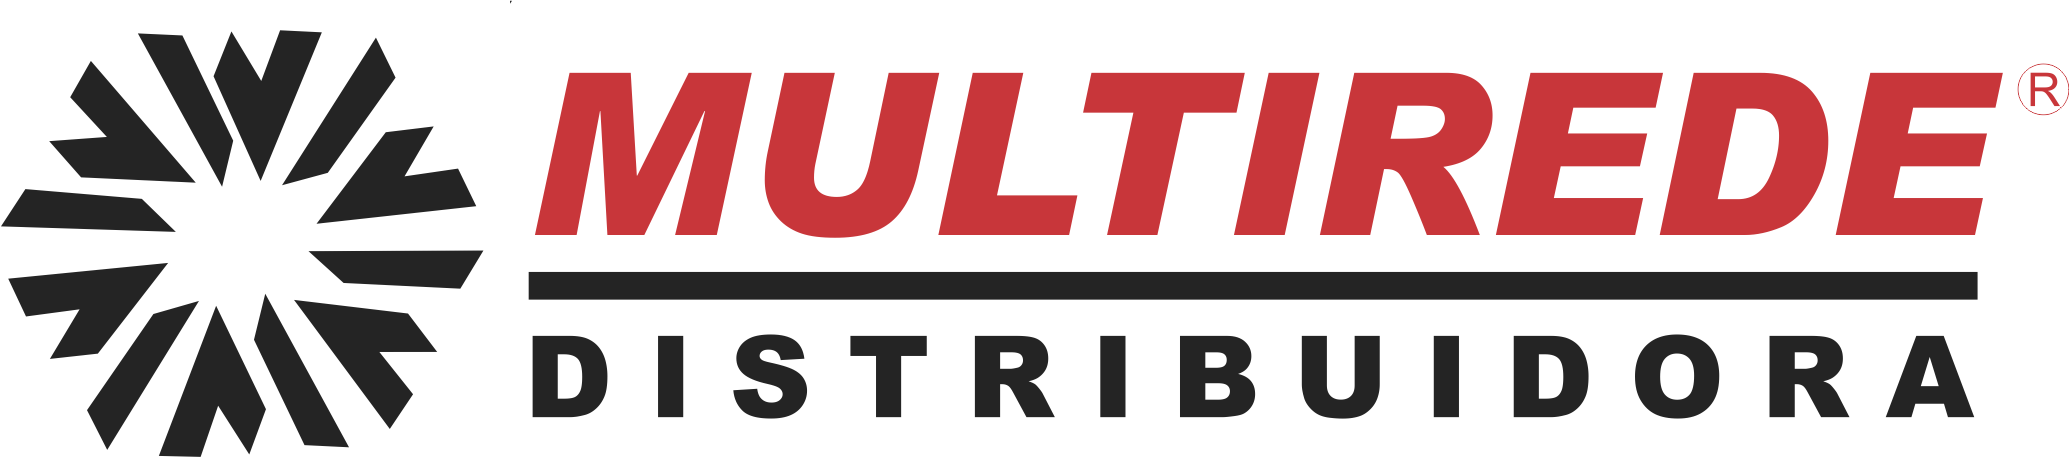 Multirede Distribuidora - Distribuidor Furukawa